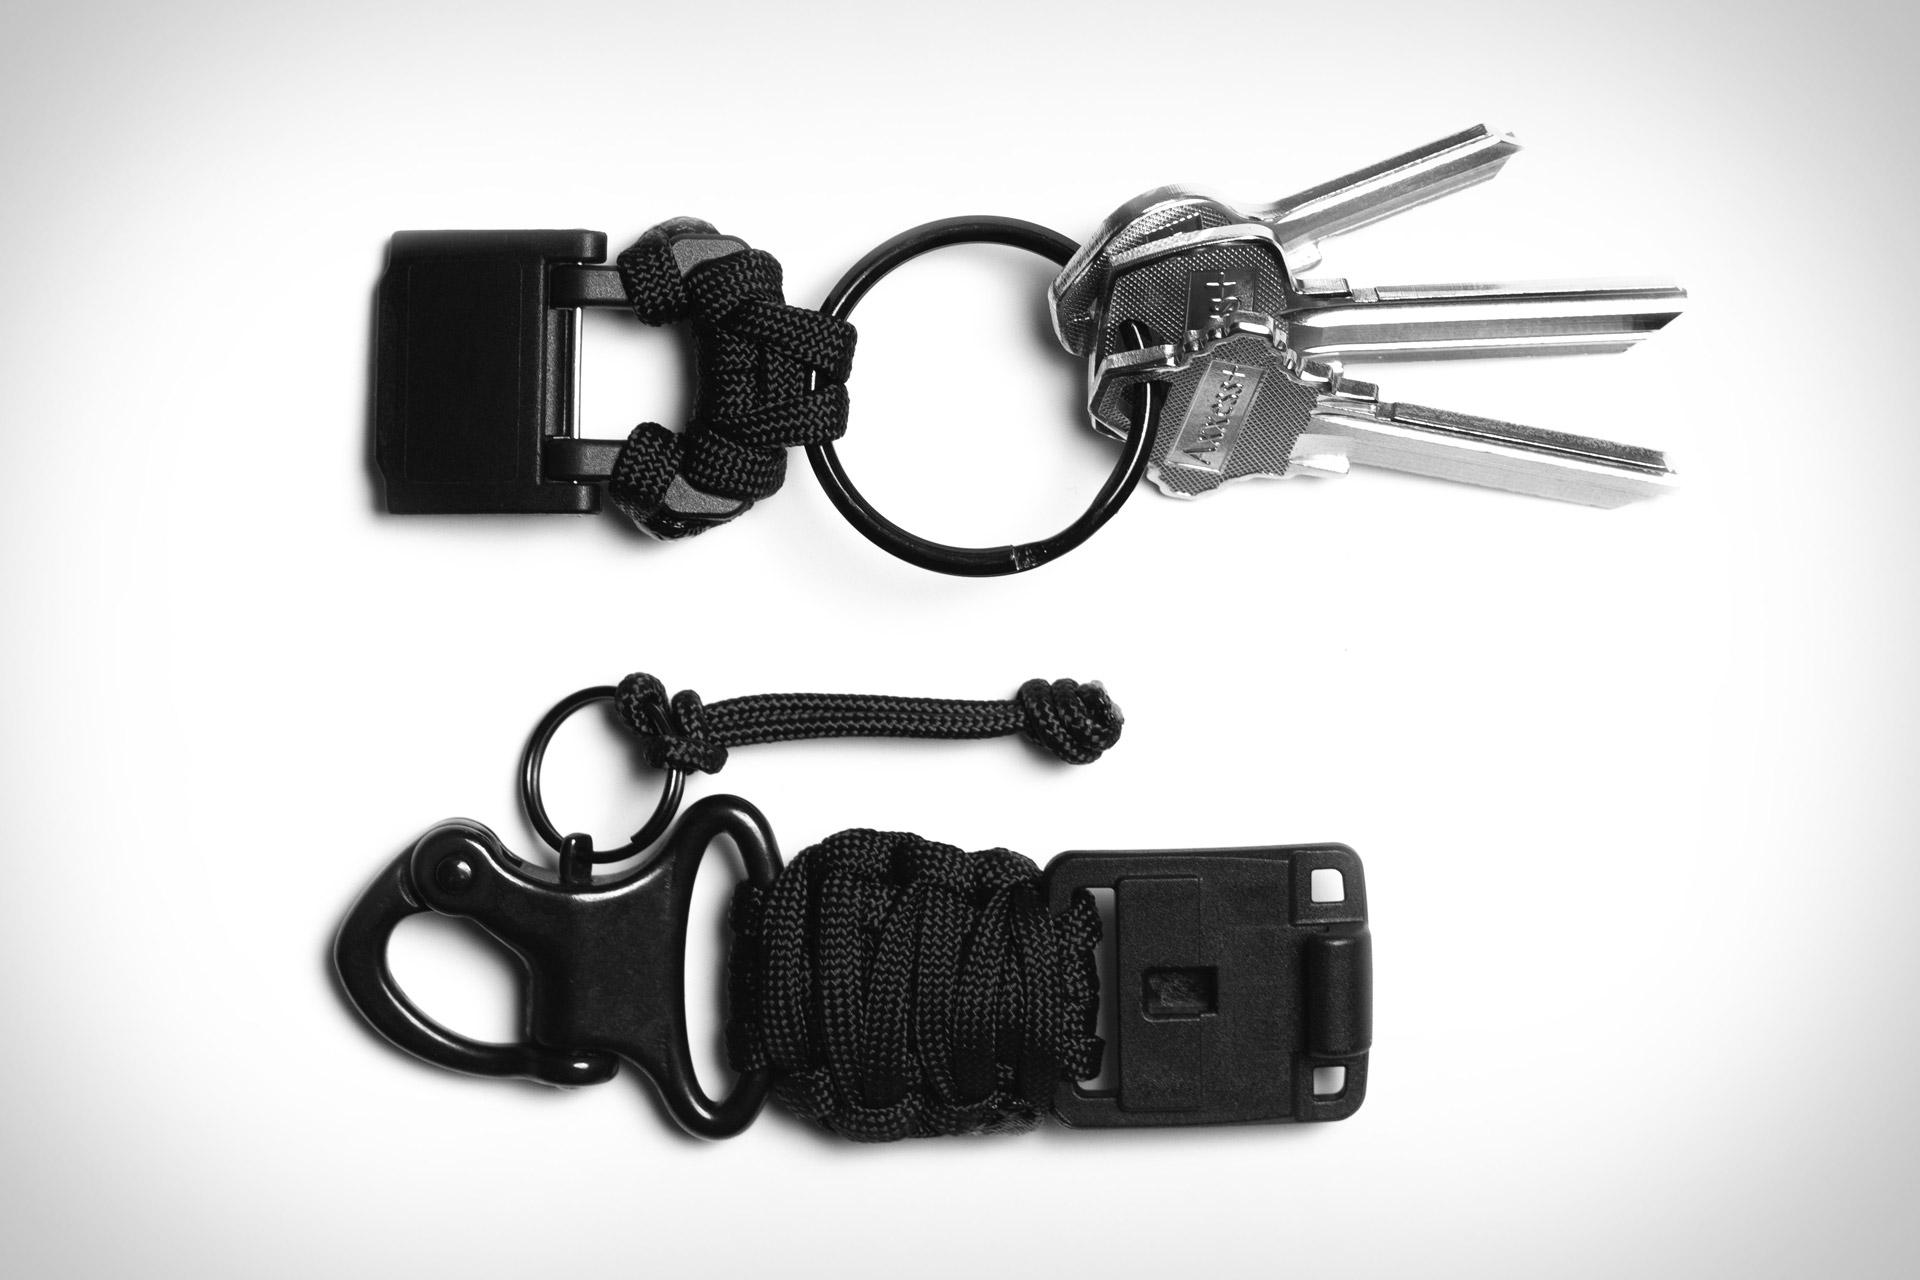 Arktype PMK Magnetic Keychain